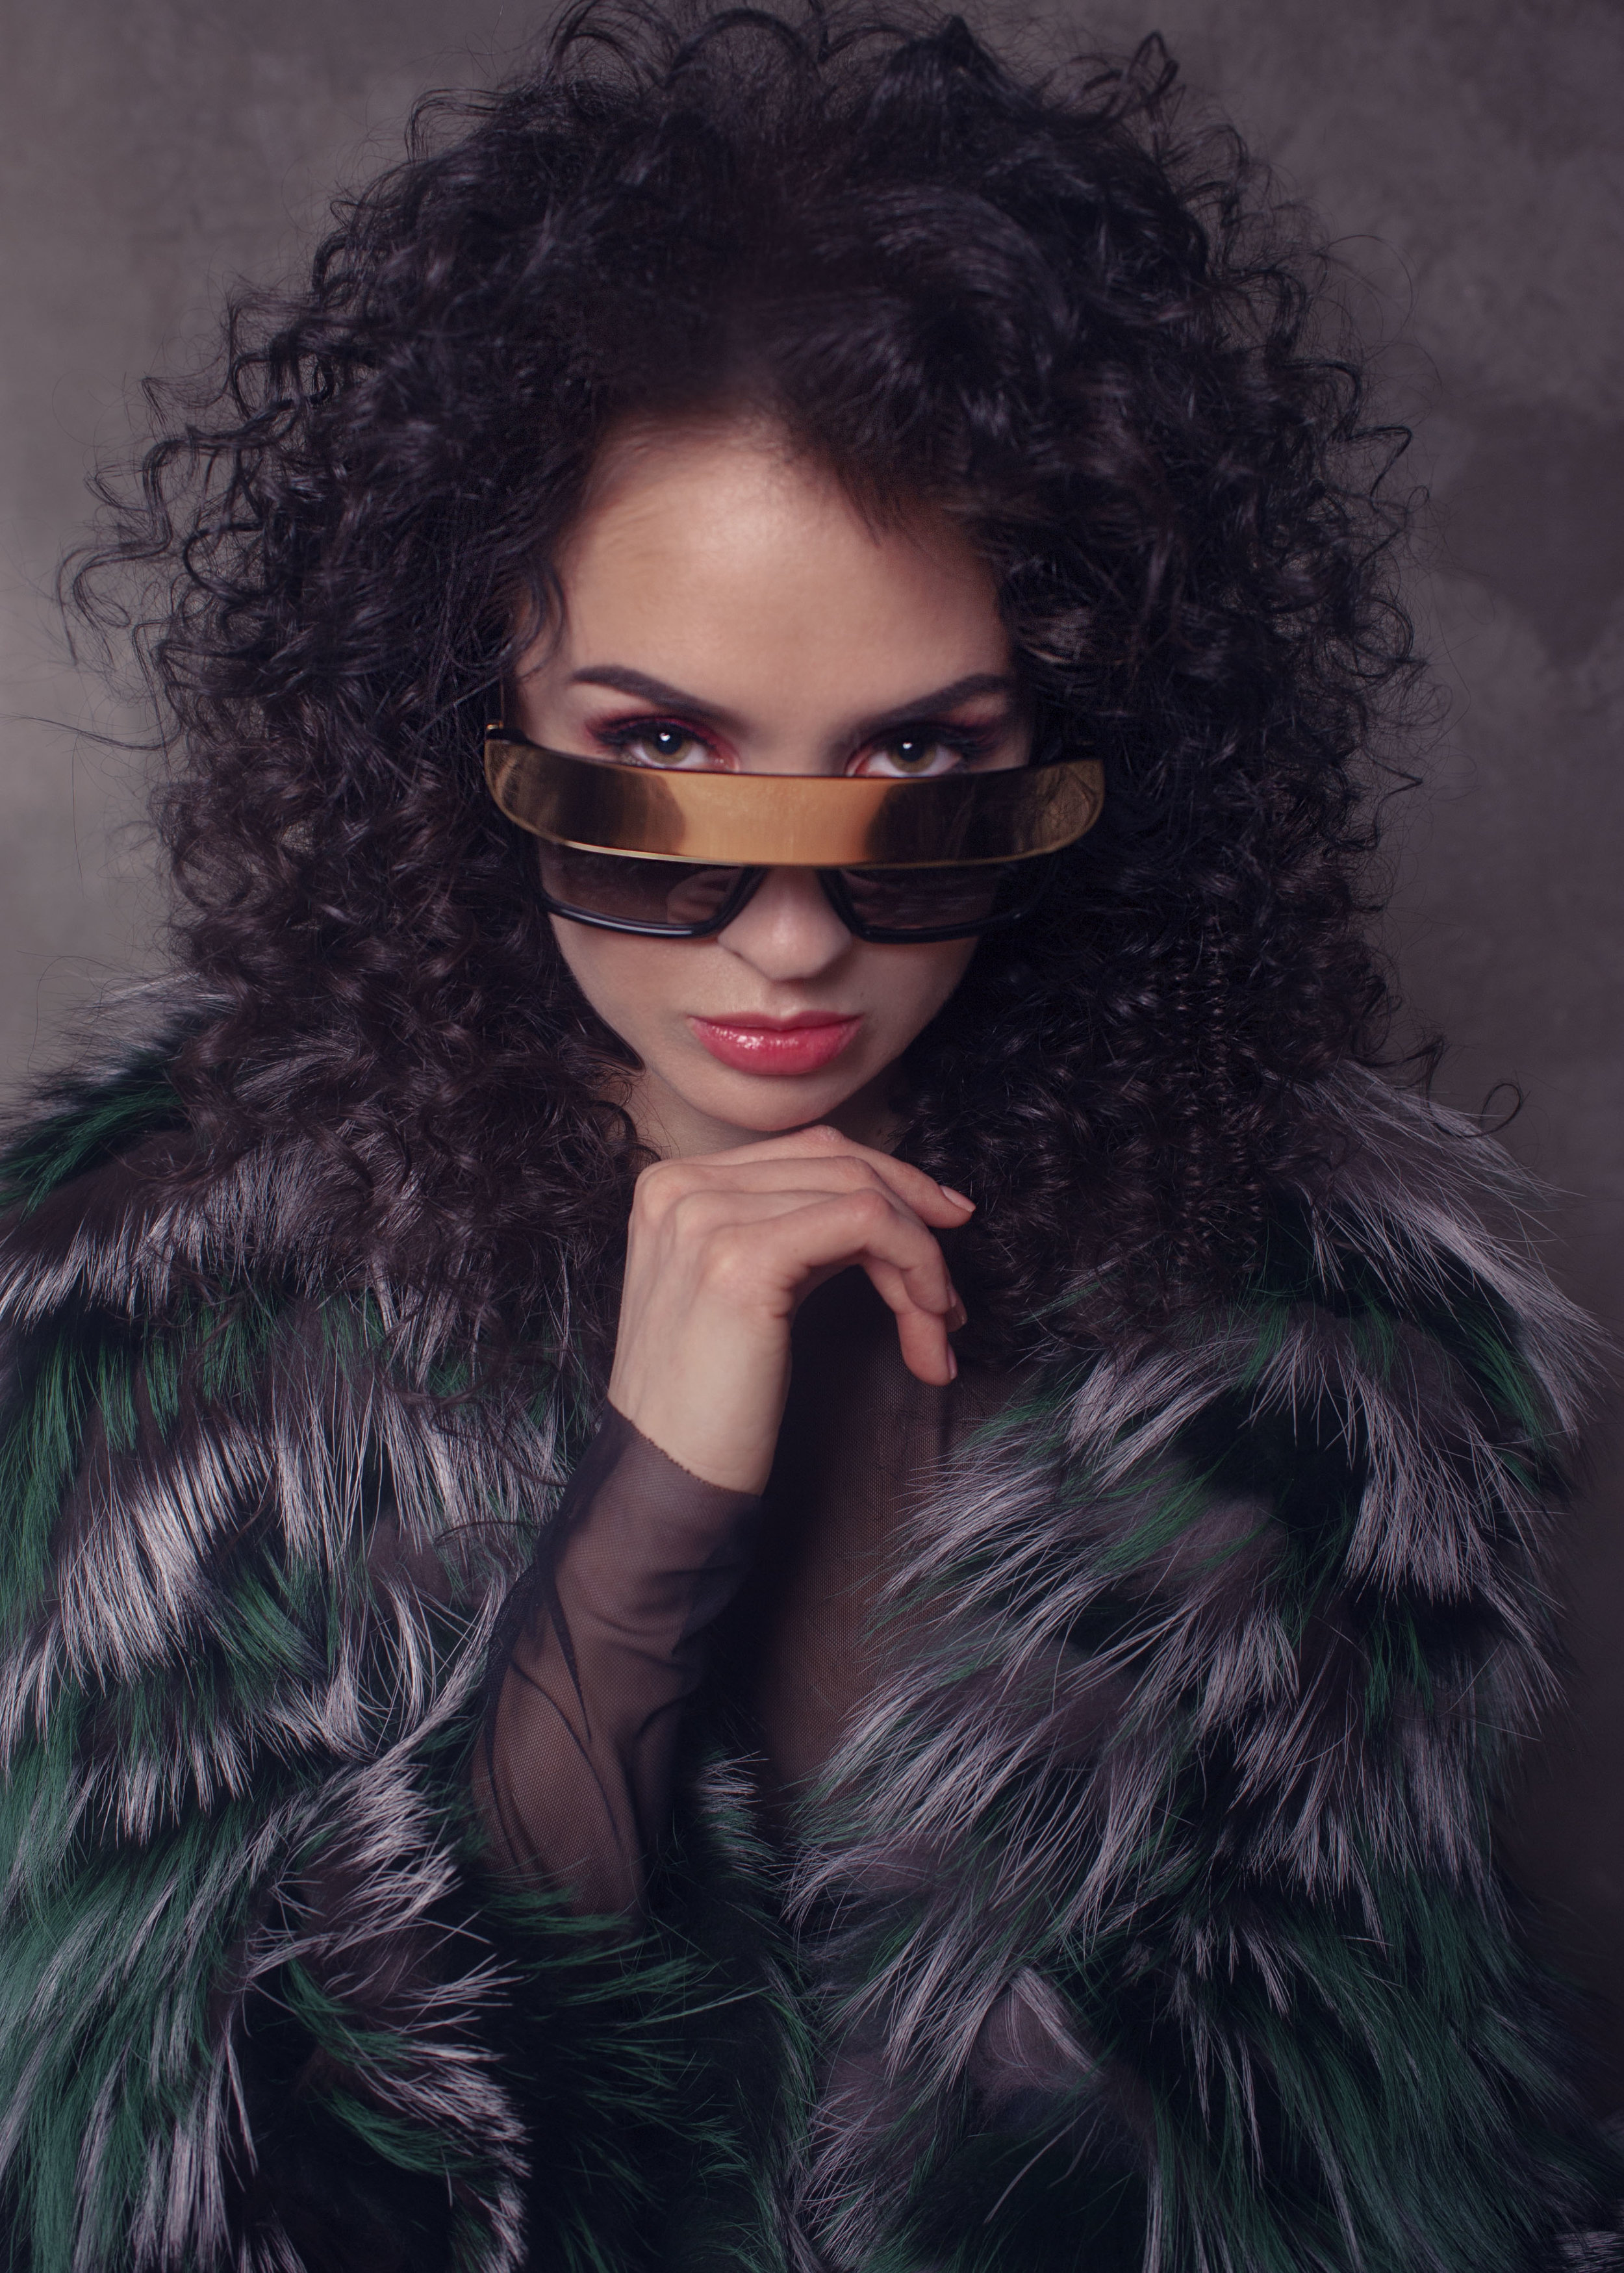 Fur Coat: Stylist  Blouse by Zarina  Sunglasses by Anna Karin Karlsson